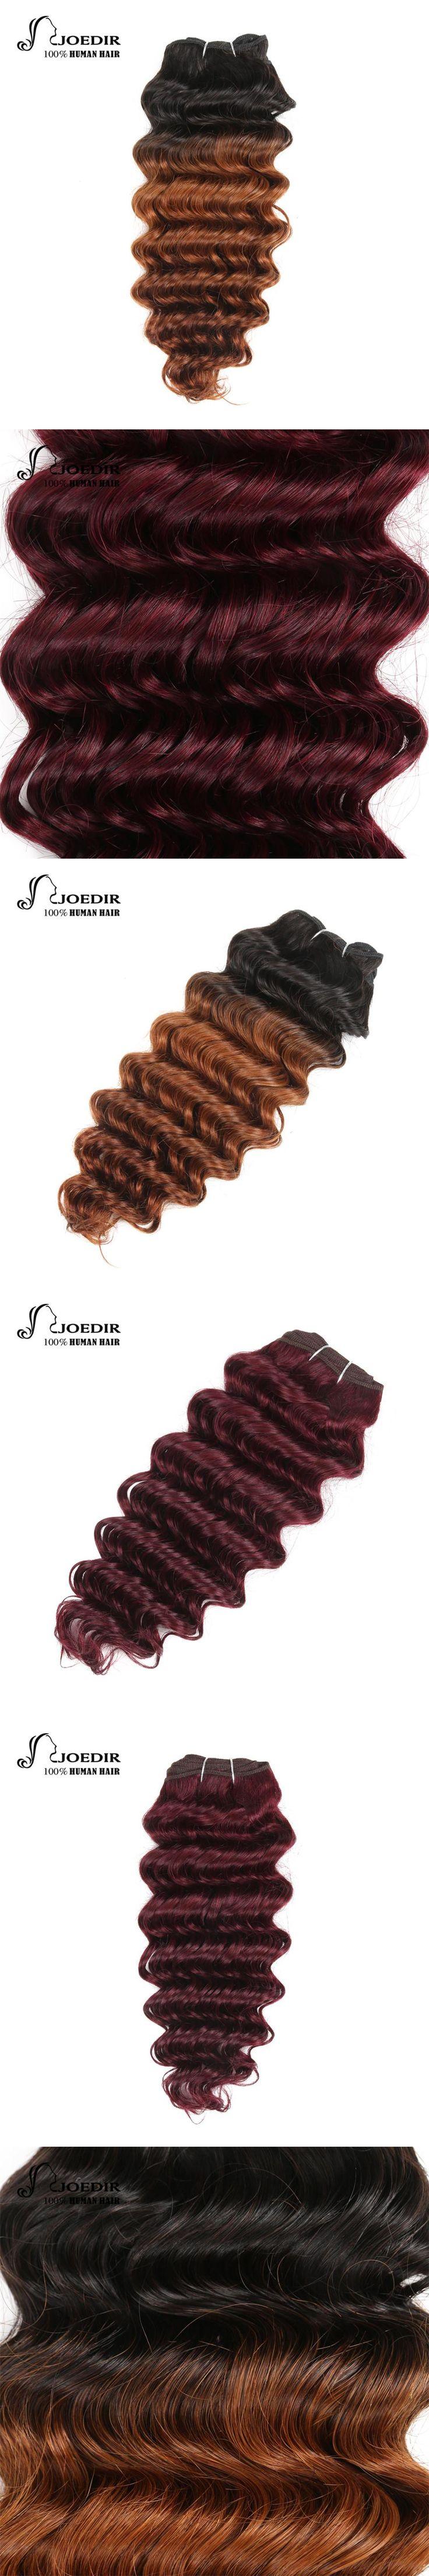 Joedir Hair Pre-Colored Brazilian Remy Human Hair Weave Nature Deep Wave #99J Burgundy Hair Bundle Deal T1B-30 Ombre Hair Bundle